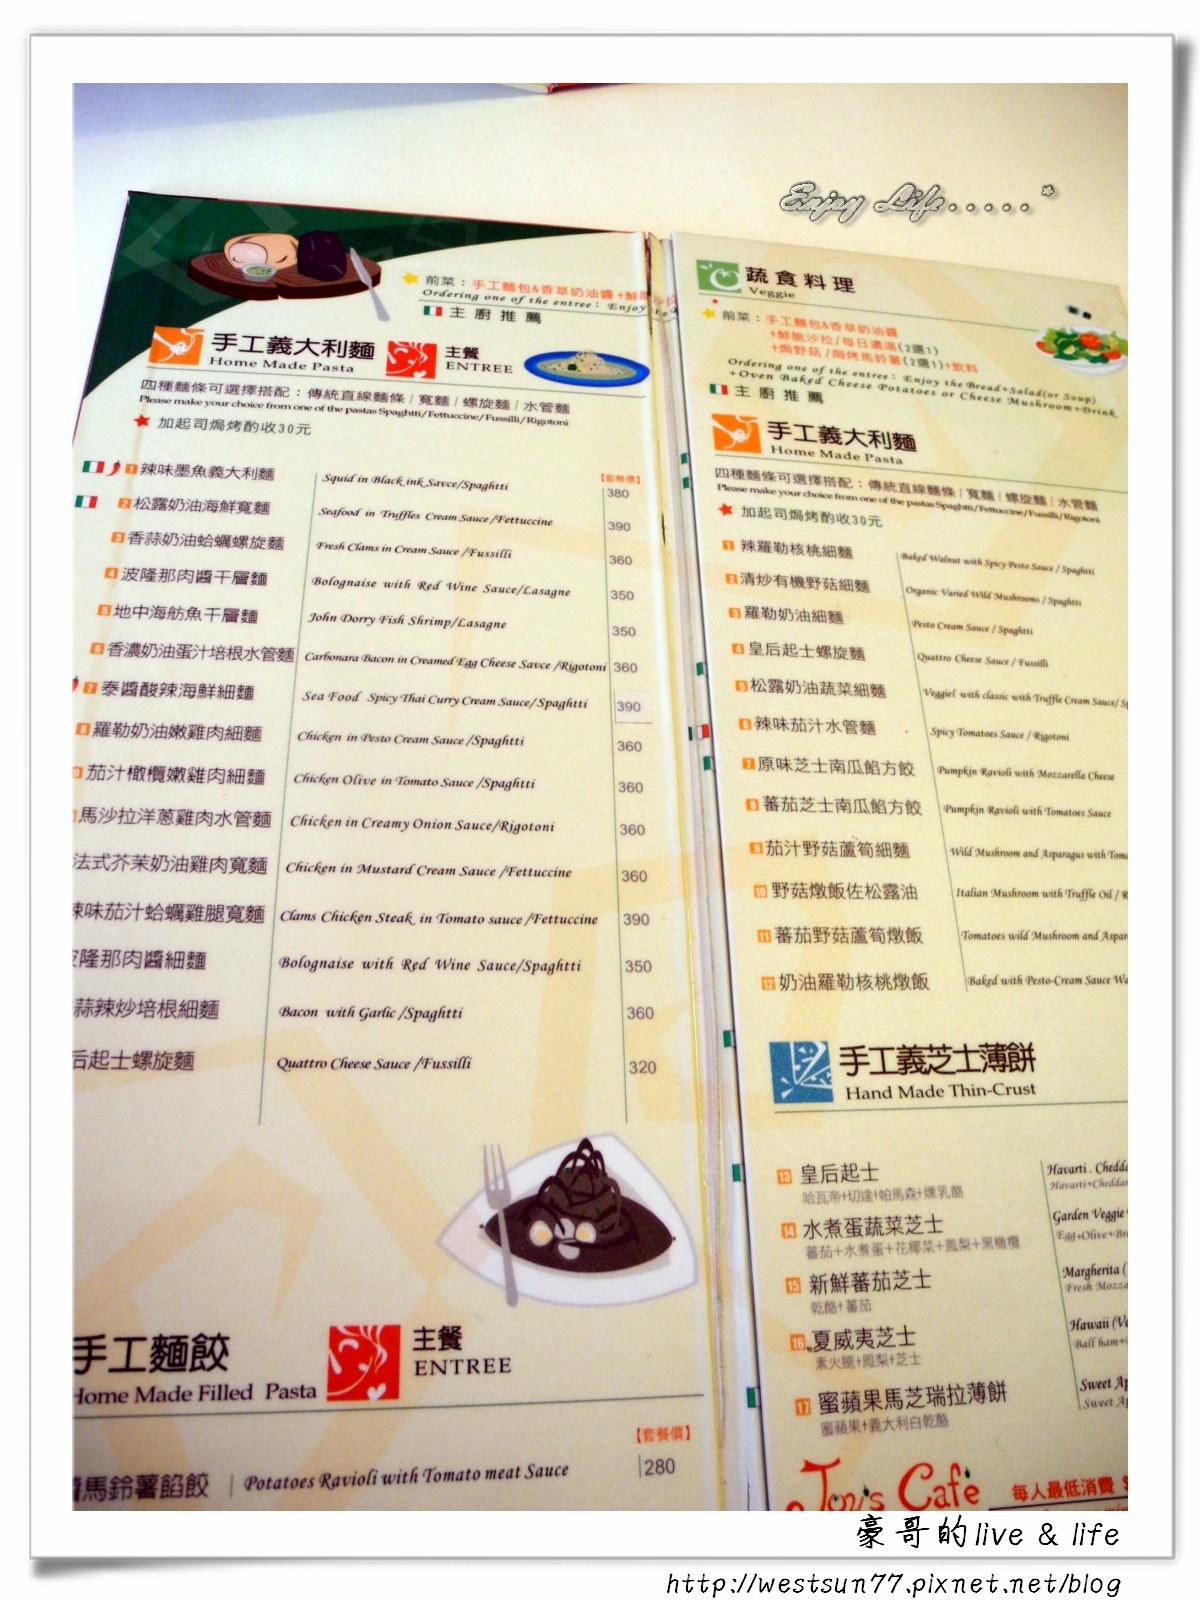 Joy's Cafe 喬帝瑭餐廳 03.jpg